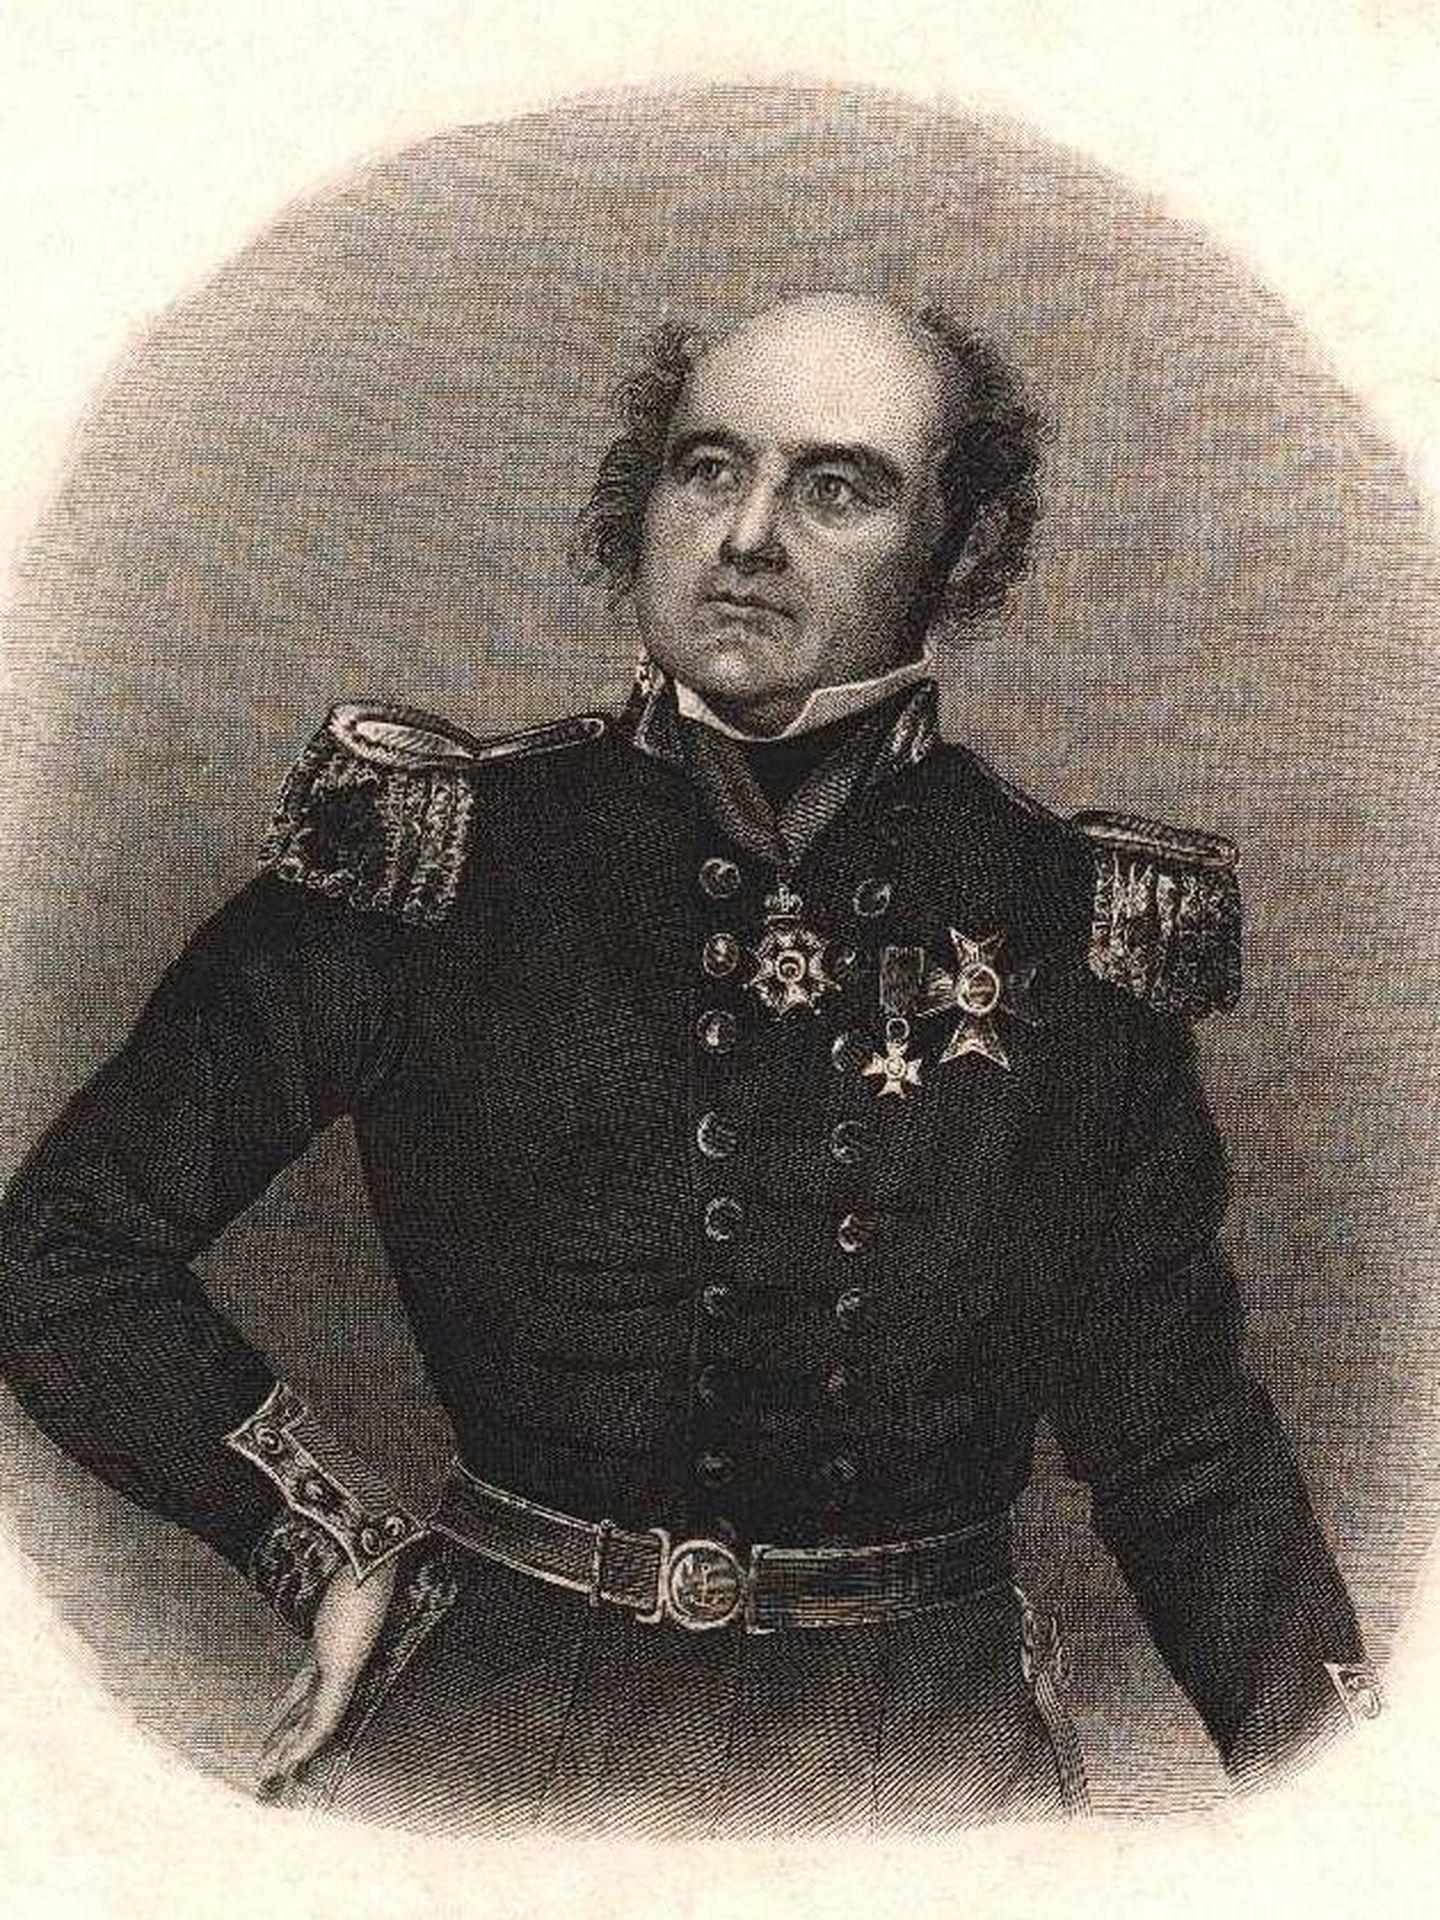 El capitán John Franklin. (Wikimedia Commons)